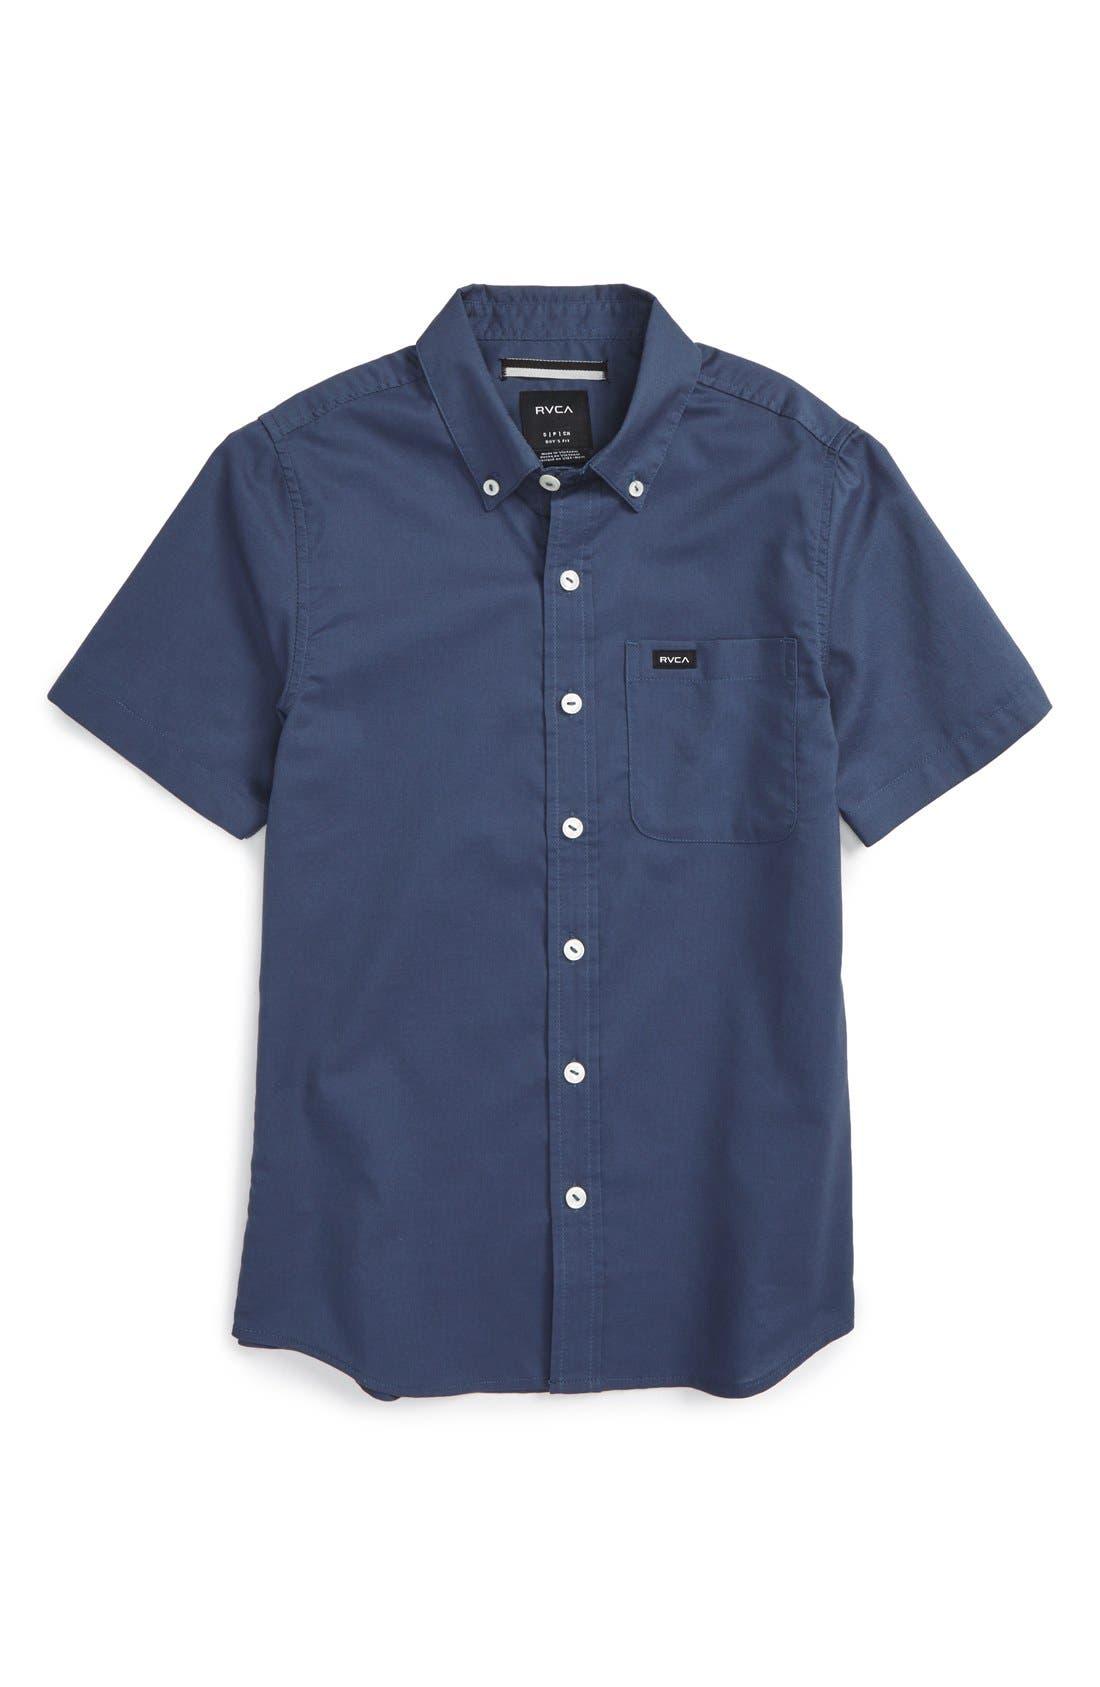 Main Image - RVCA 'That'll Do' Woven Shirt (Big Boys)